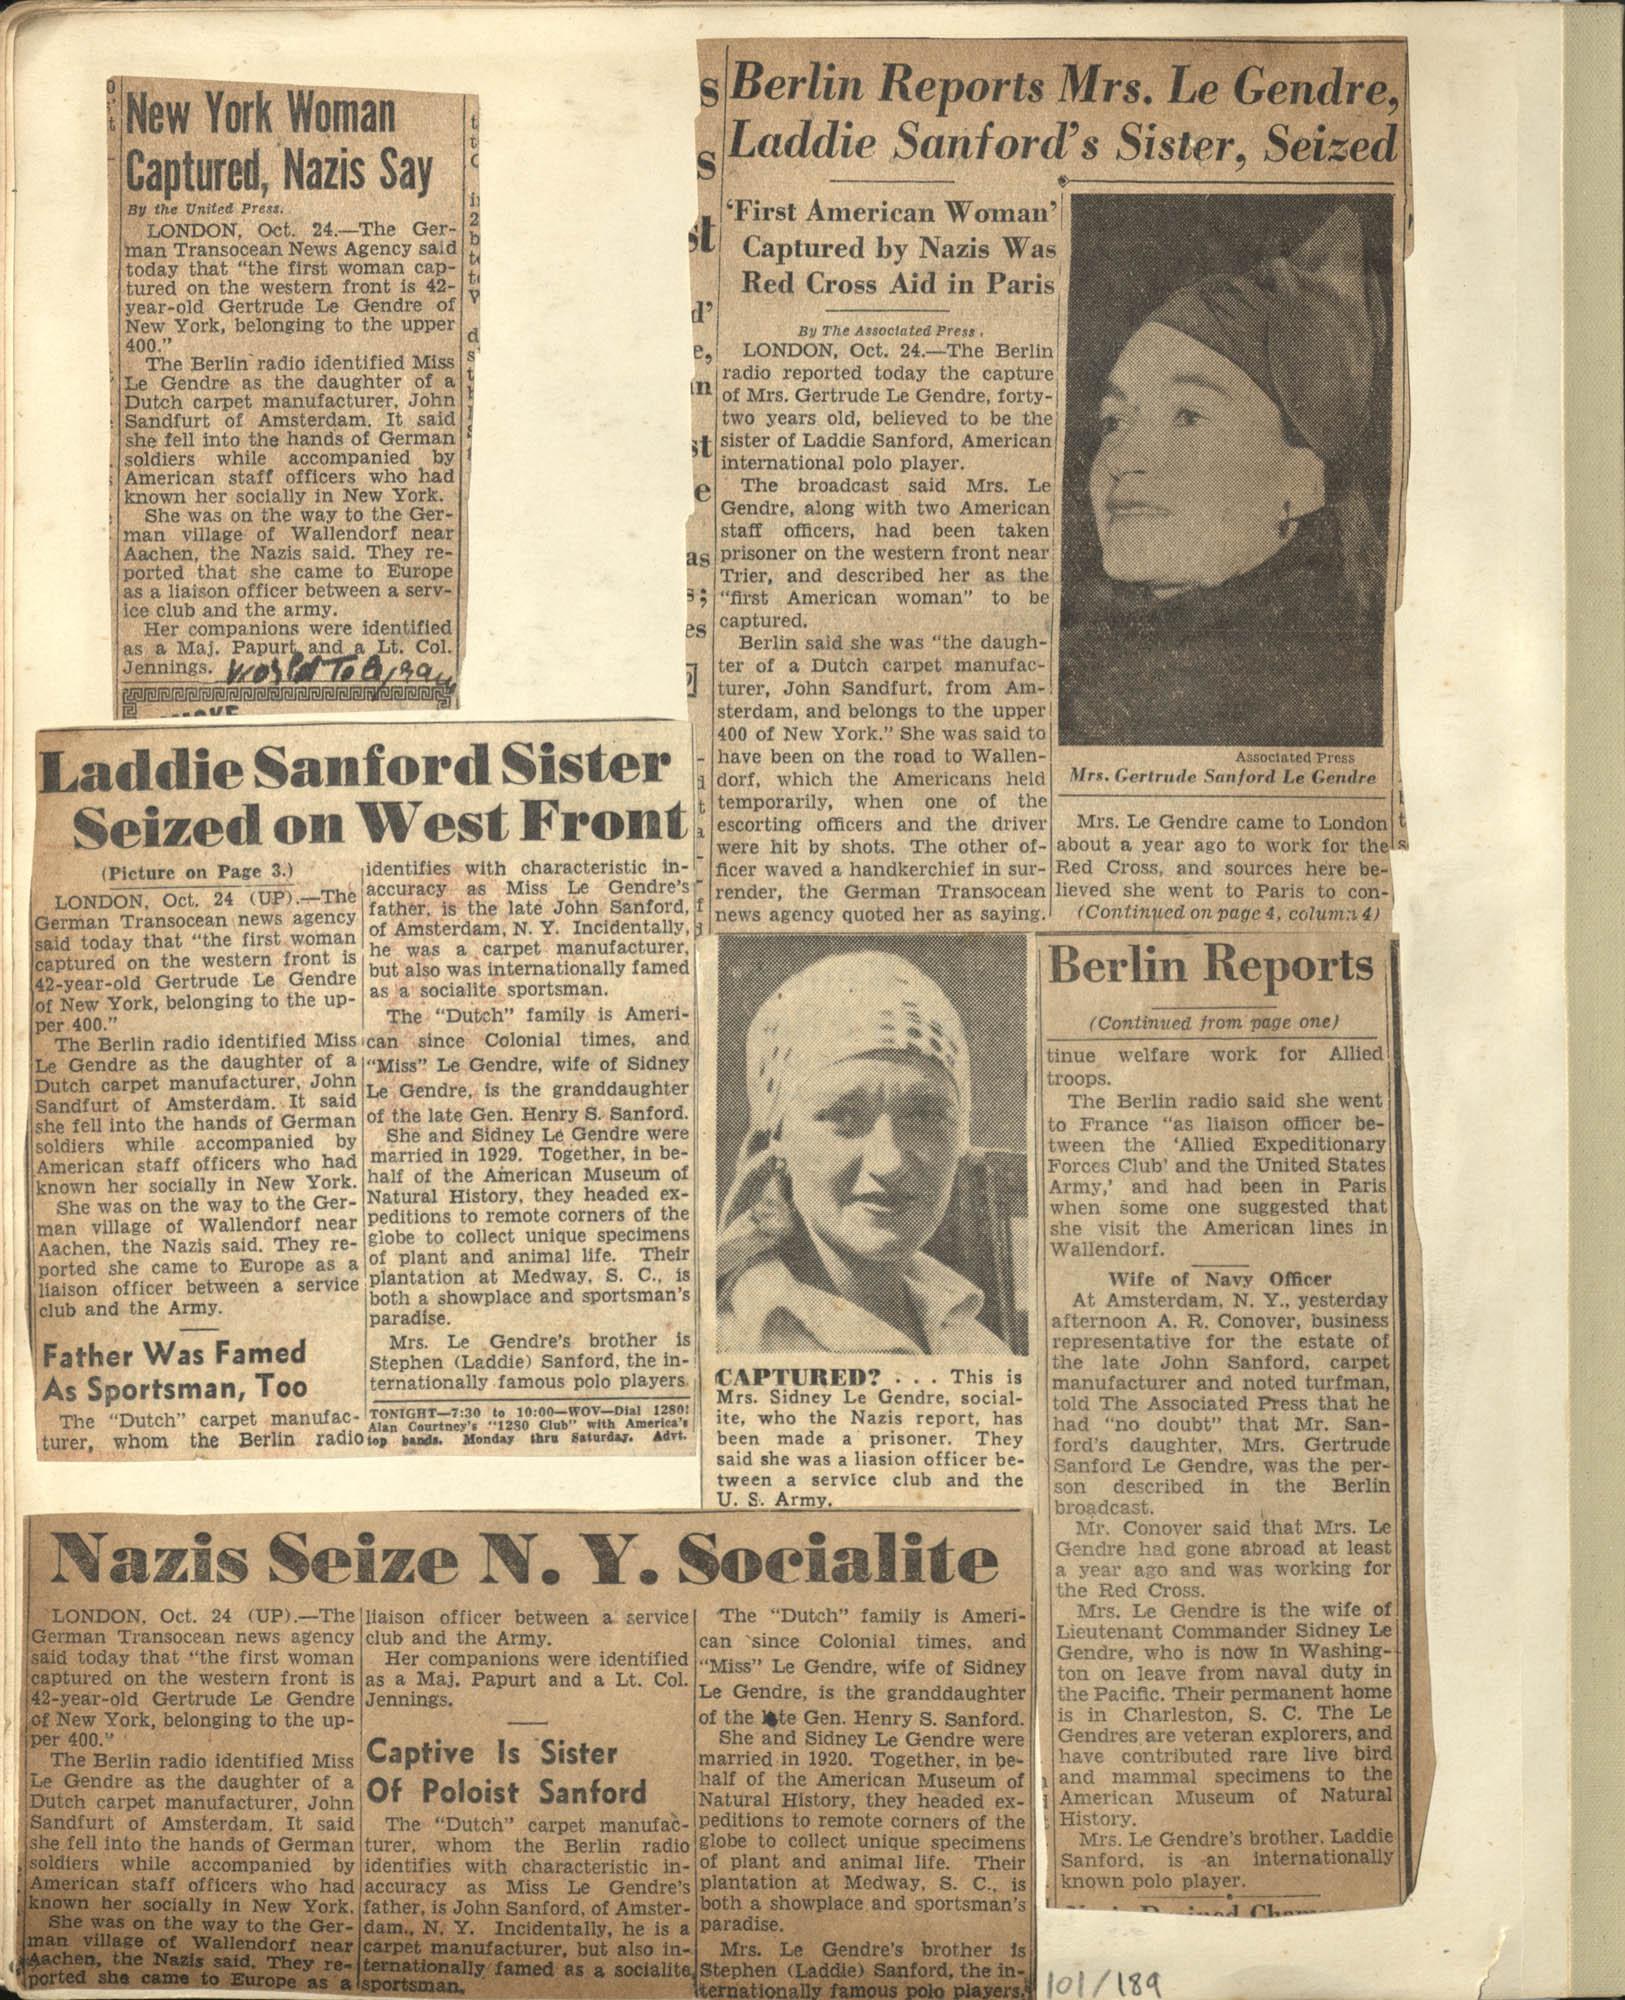 Gertrude Legendre OSS Scrapbook, 1944, Page 101